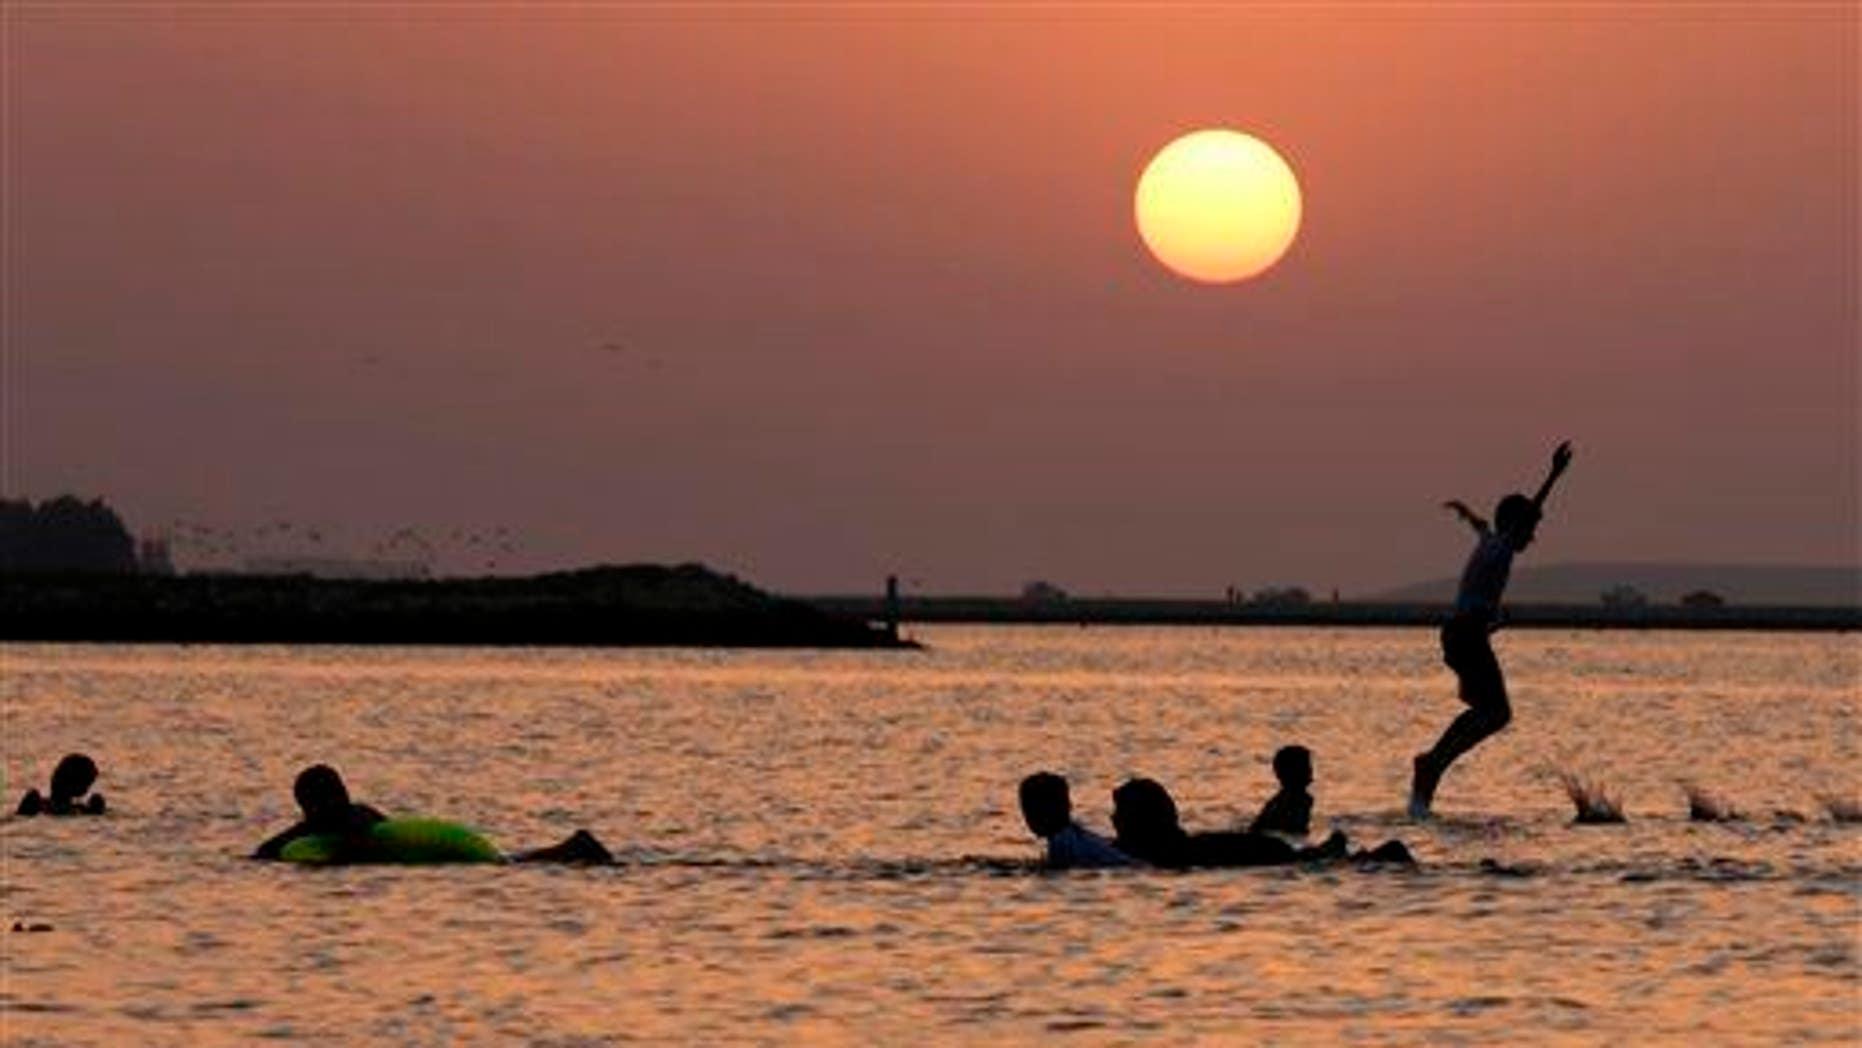 Bahraini children play along the Persian Gulf shore as the sun sets in Karranah, Bahrain, on Sept. 20, 2014.